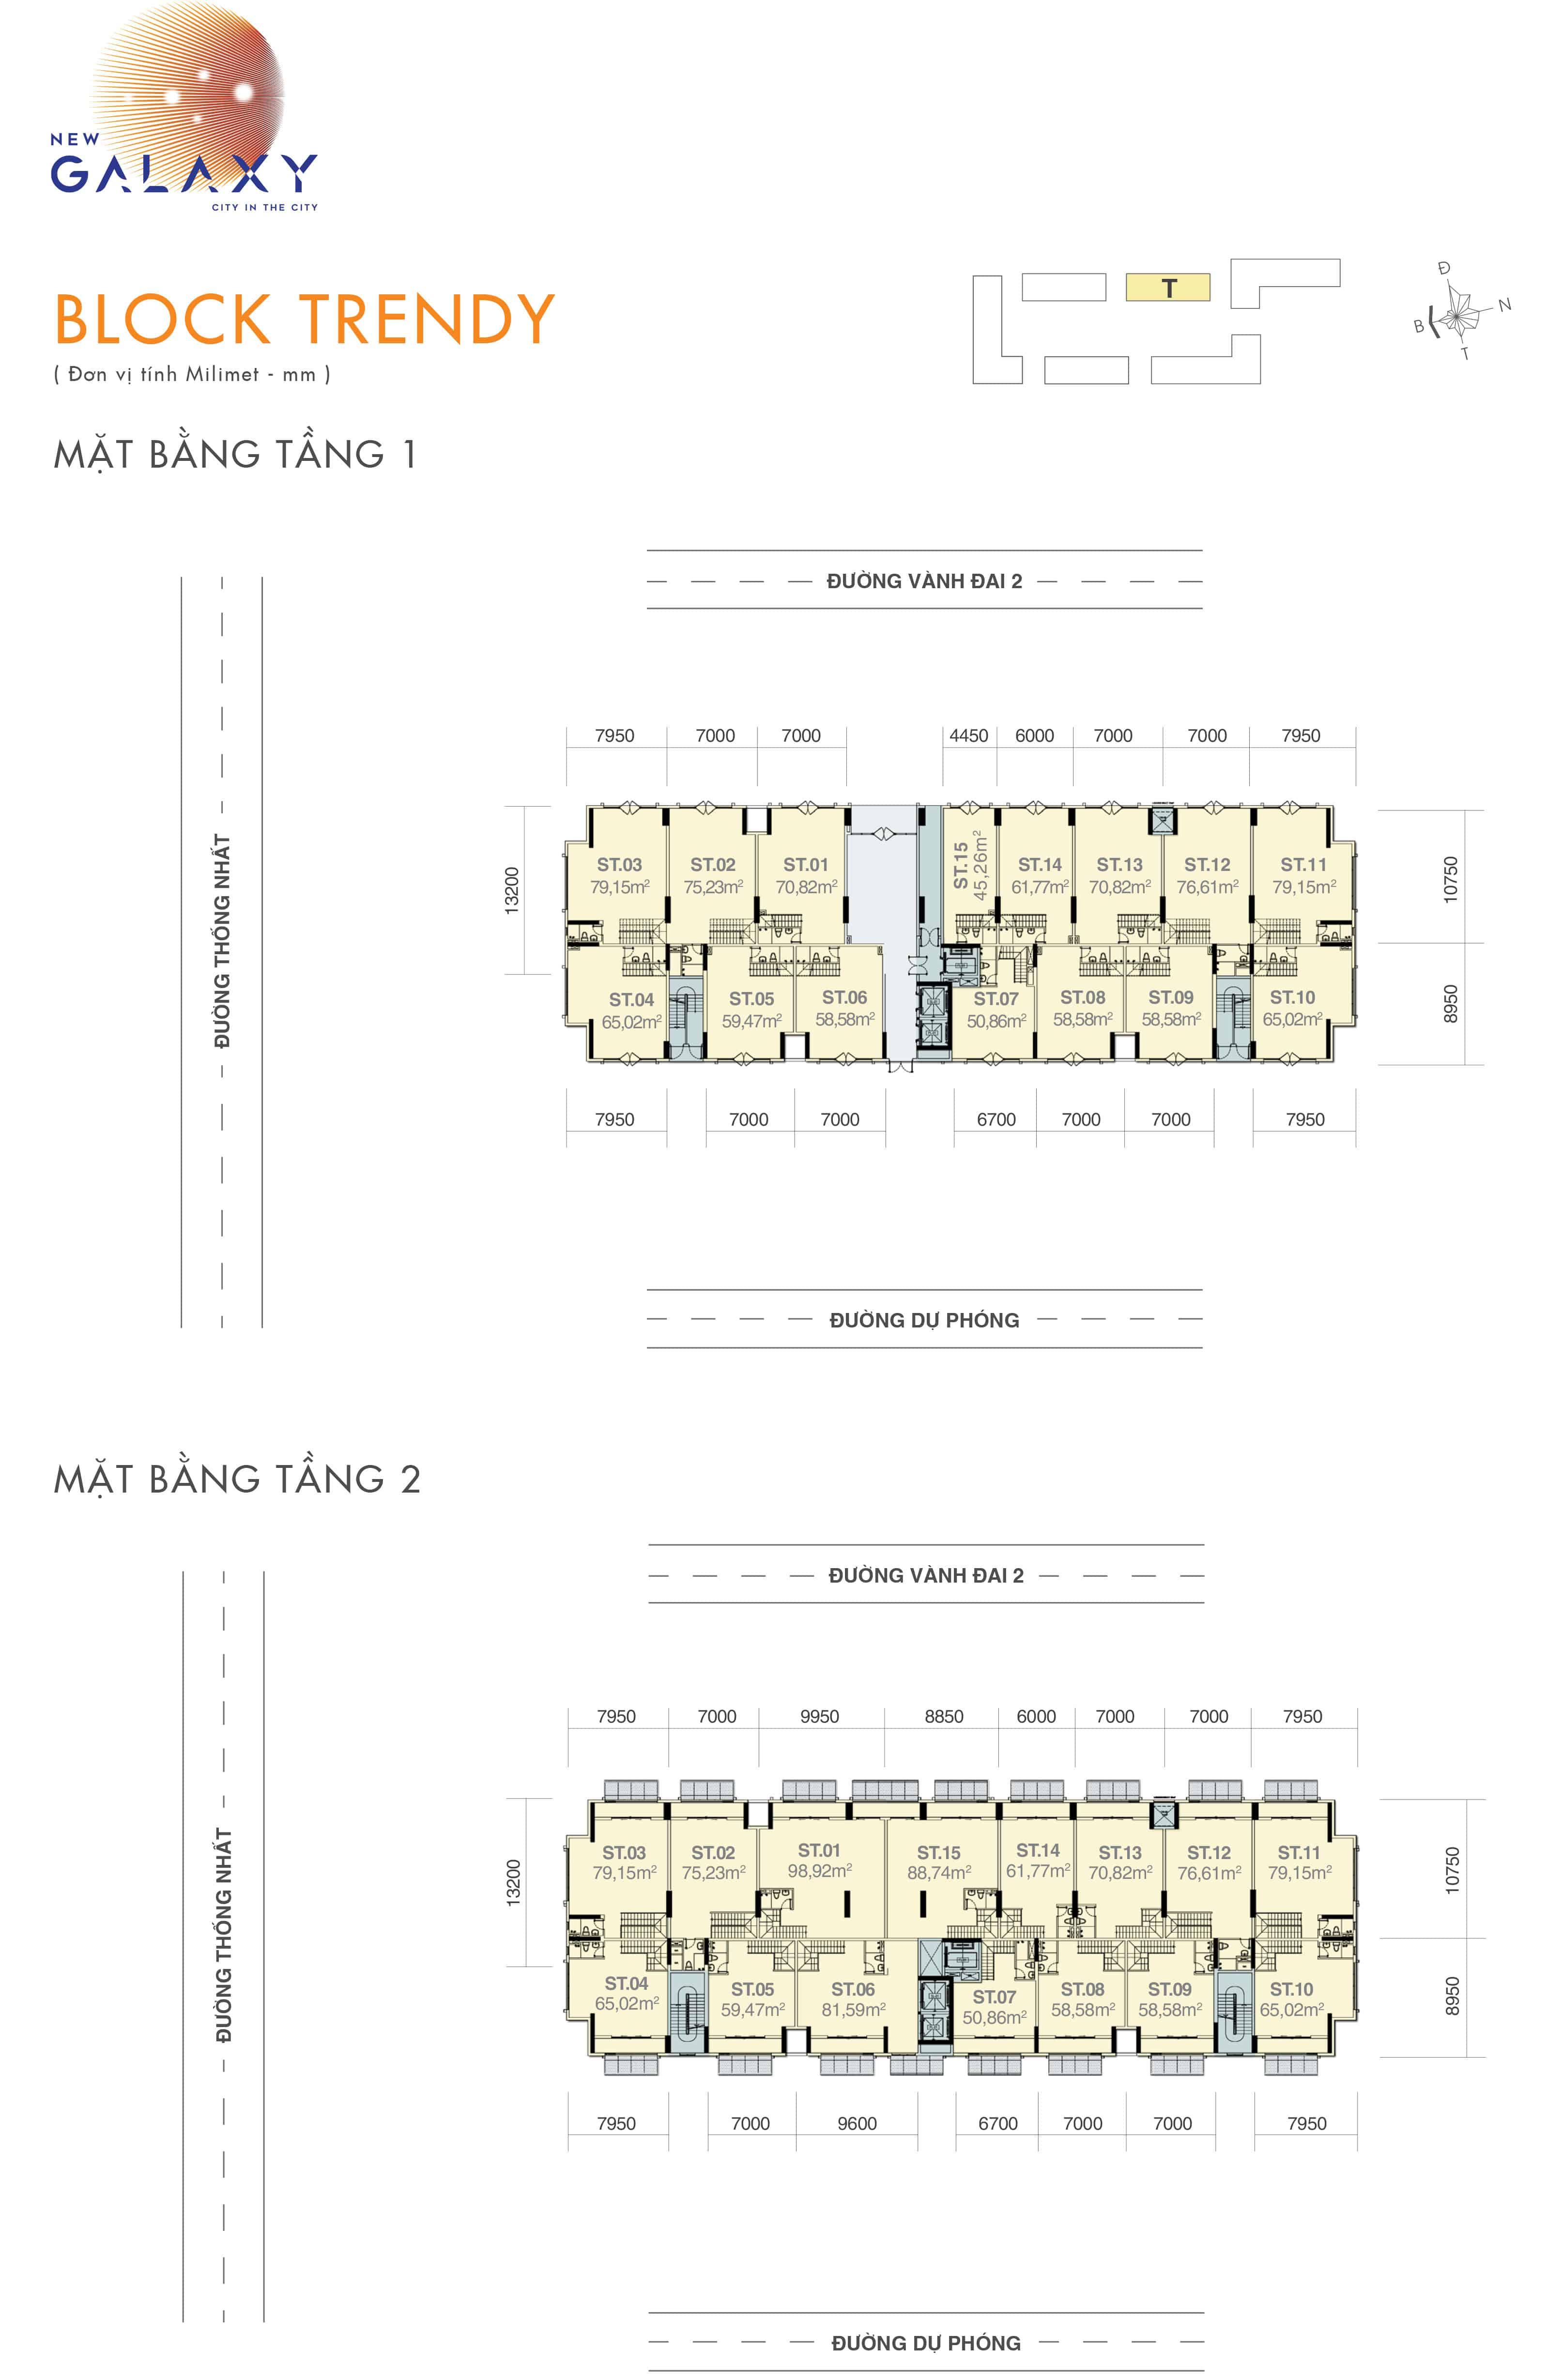 Chi tiết thiết kế shophouse tầng 1-2 block BLOCK TRENDY